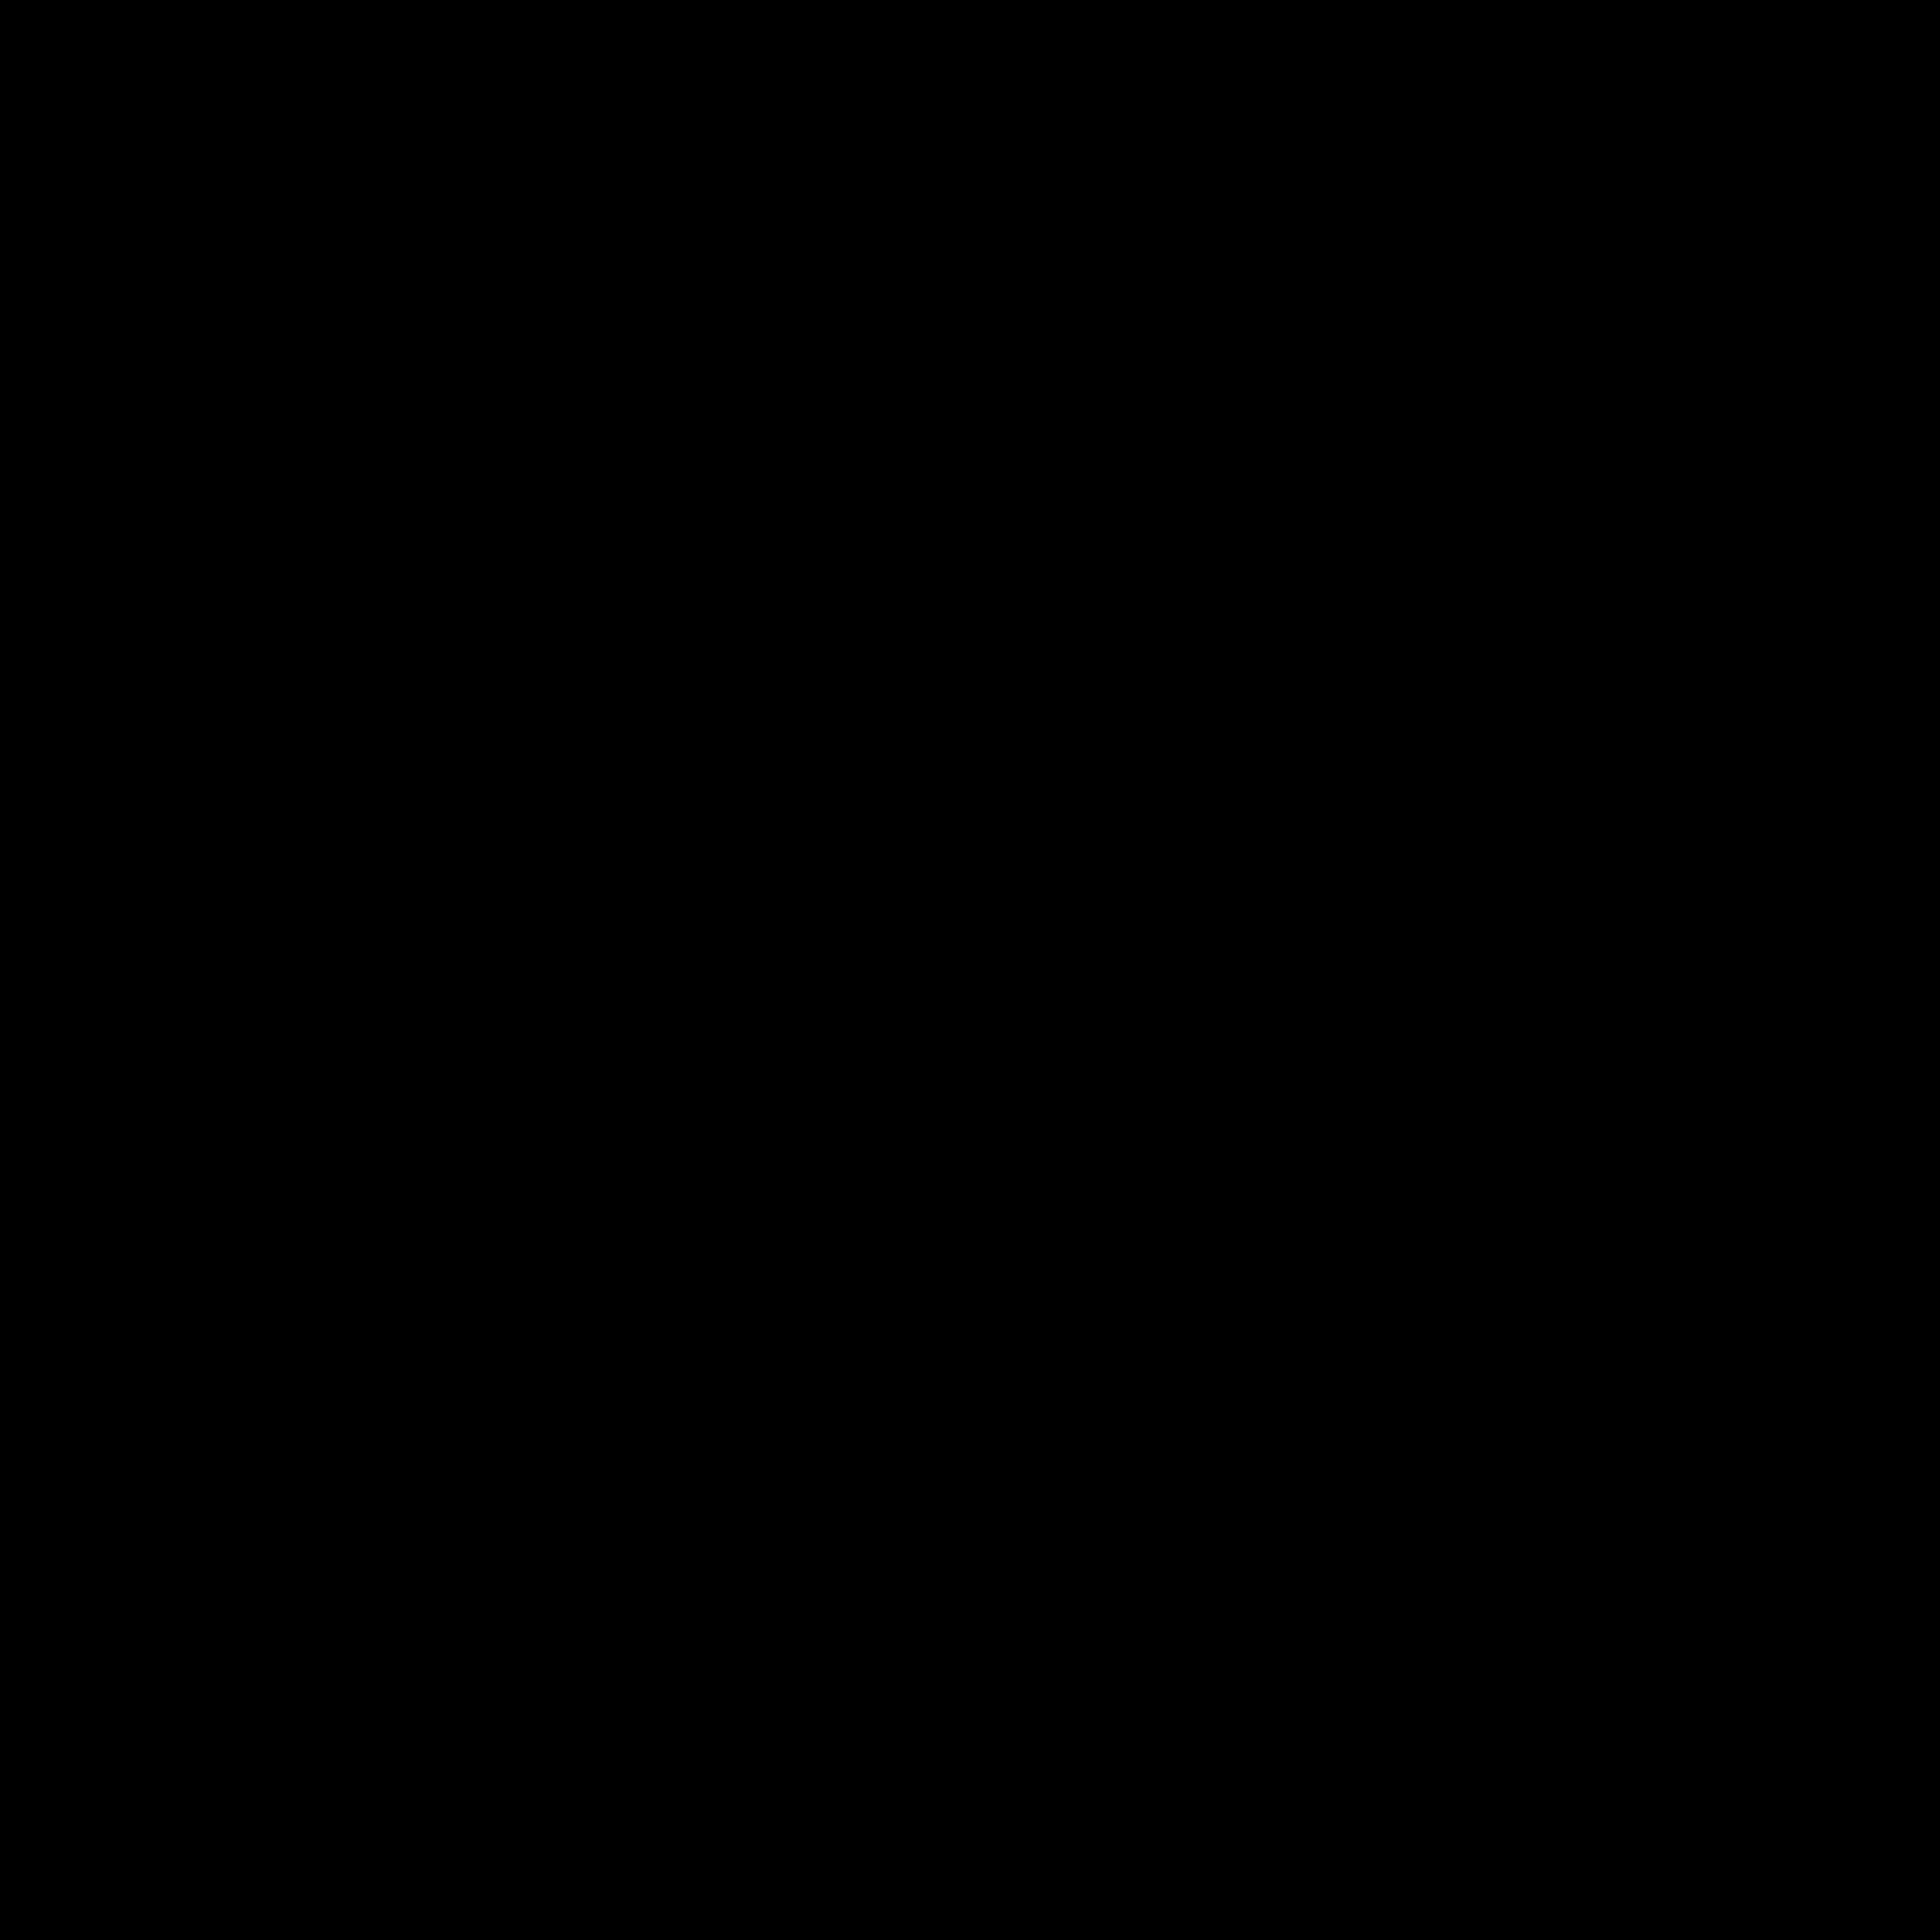 Lv (1)